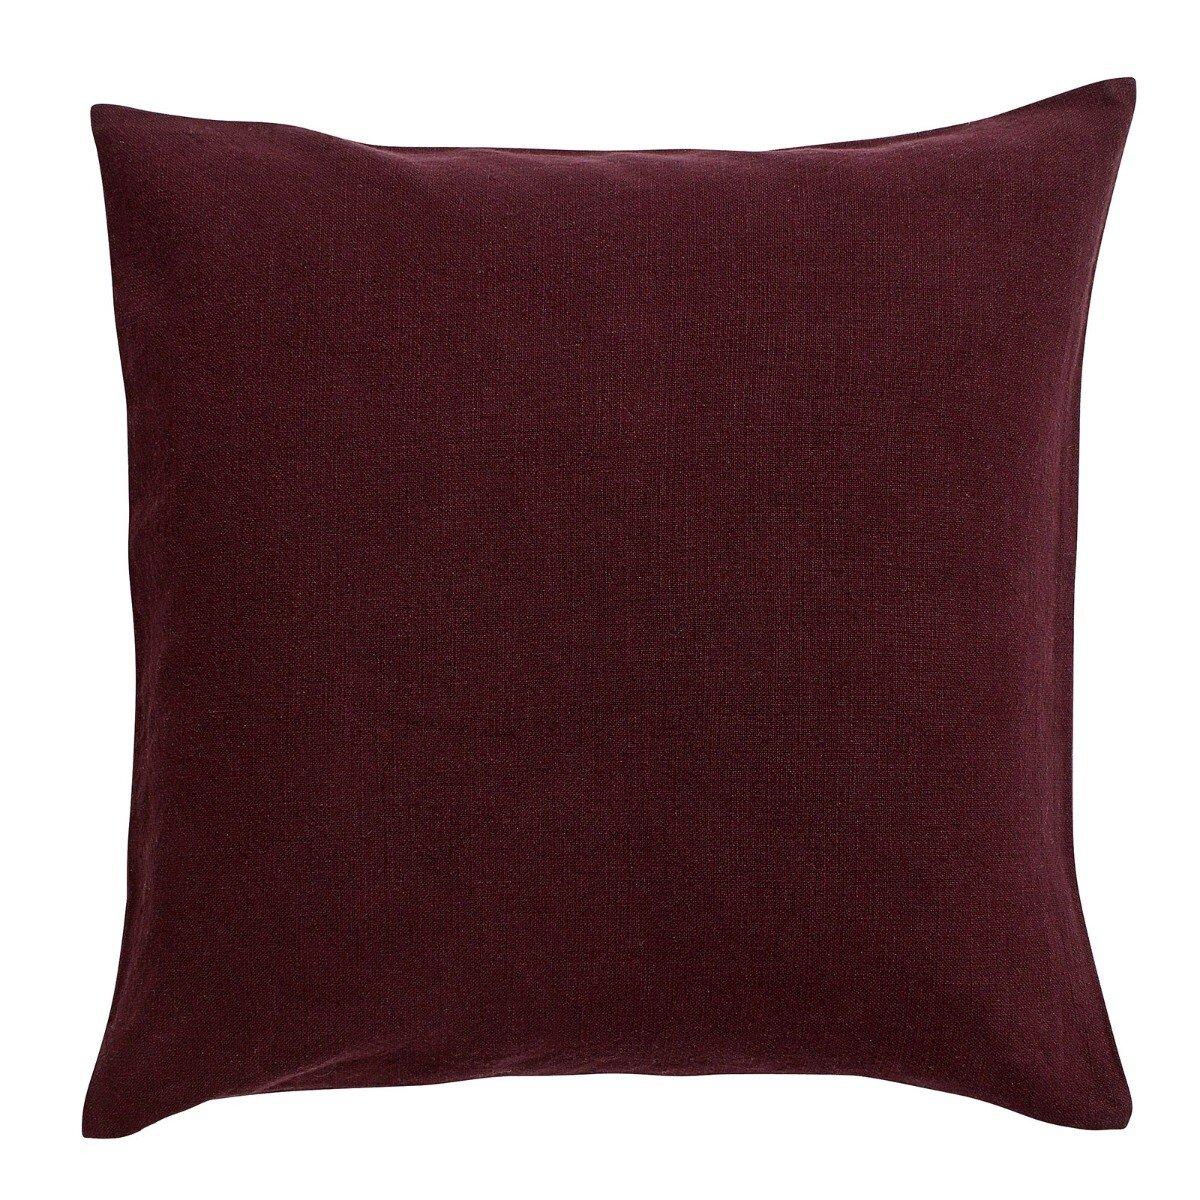 Nordal kussenhoes divine rood 50 x 50